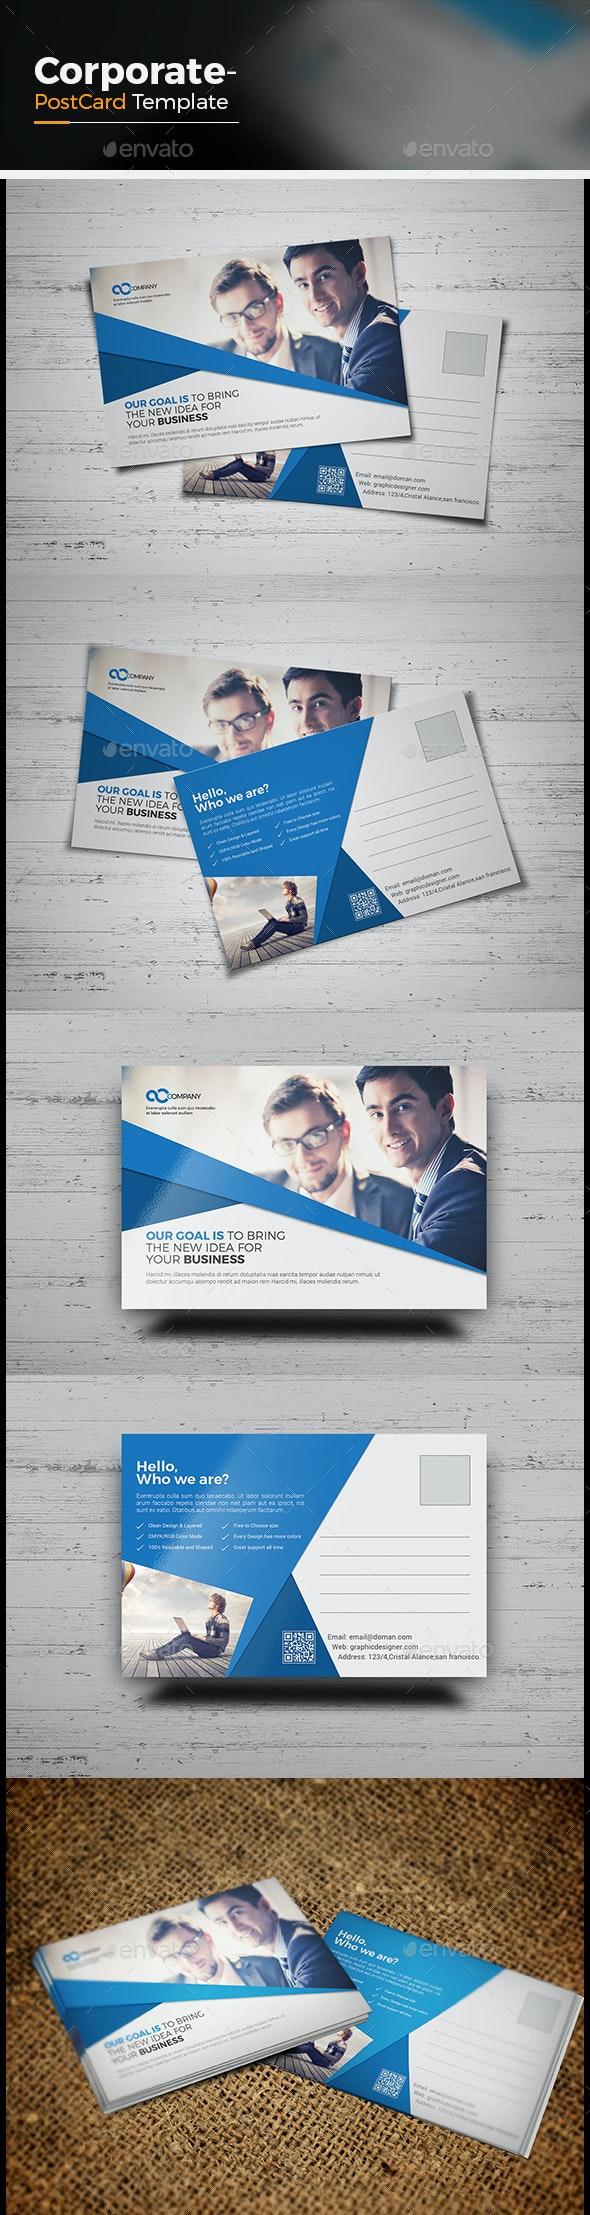 Corporate Postcard Template - Cards & Invites Print Templates